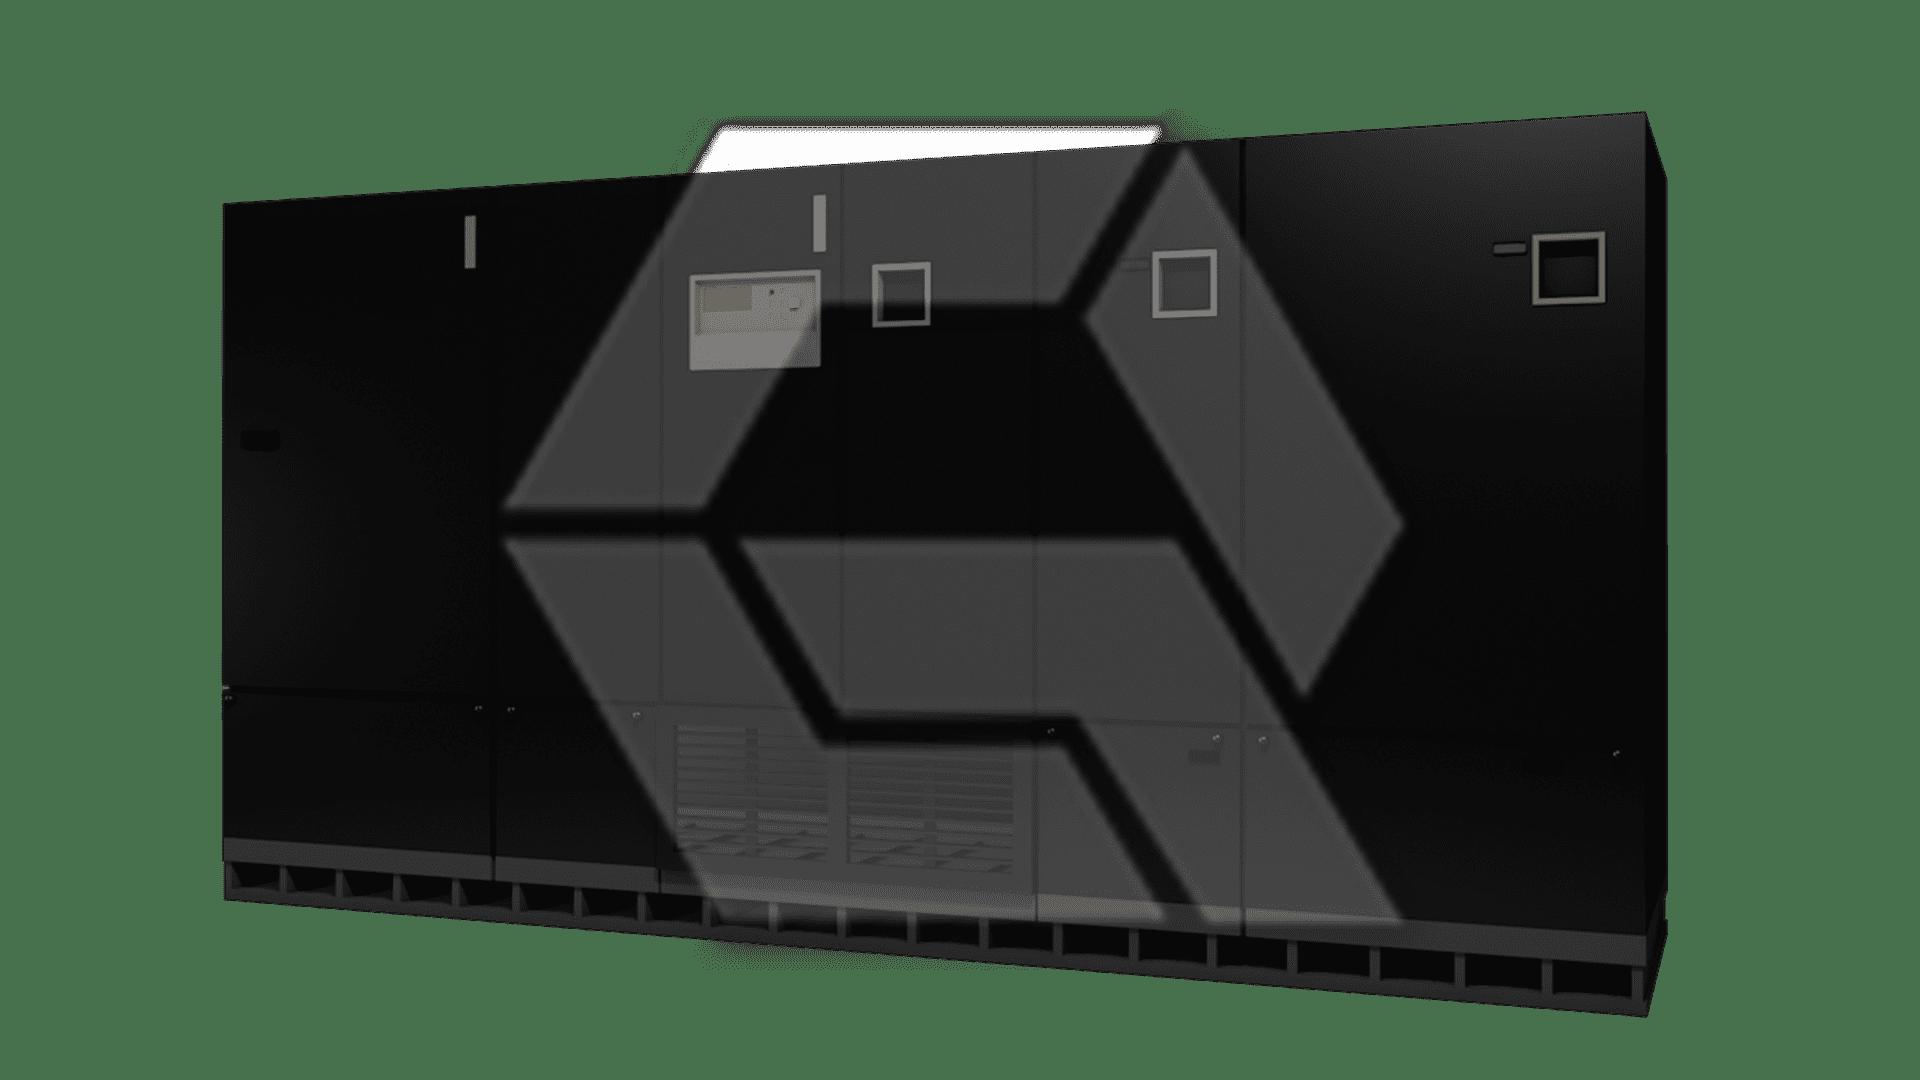 UPS Dark